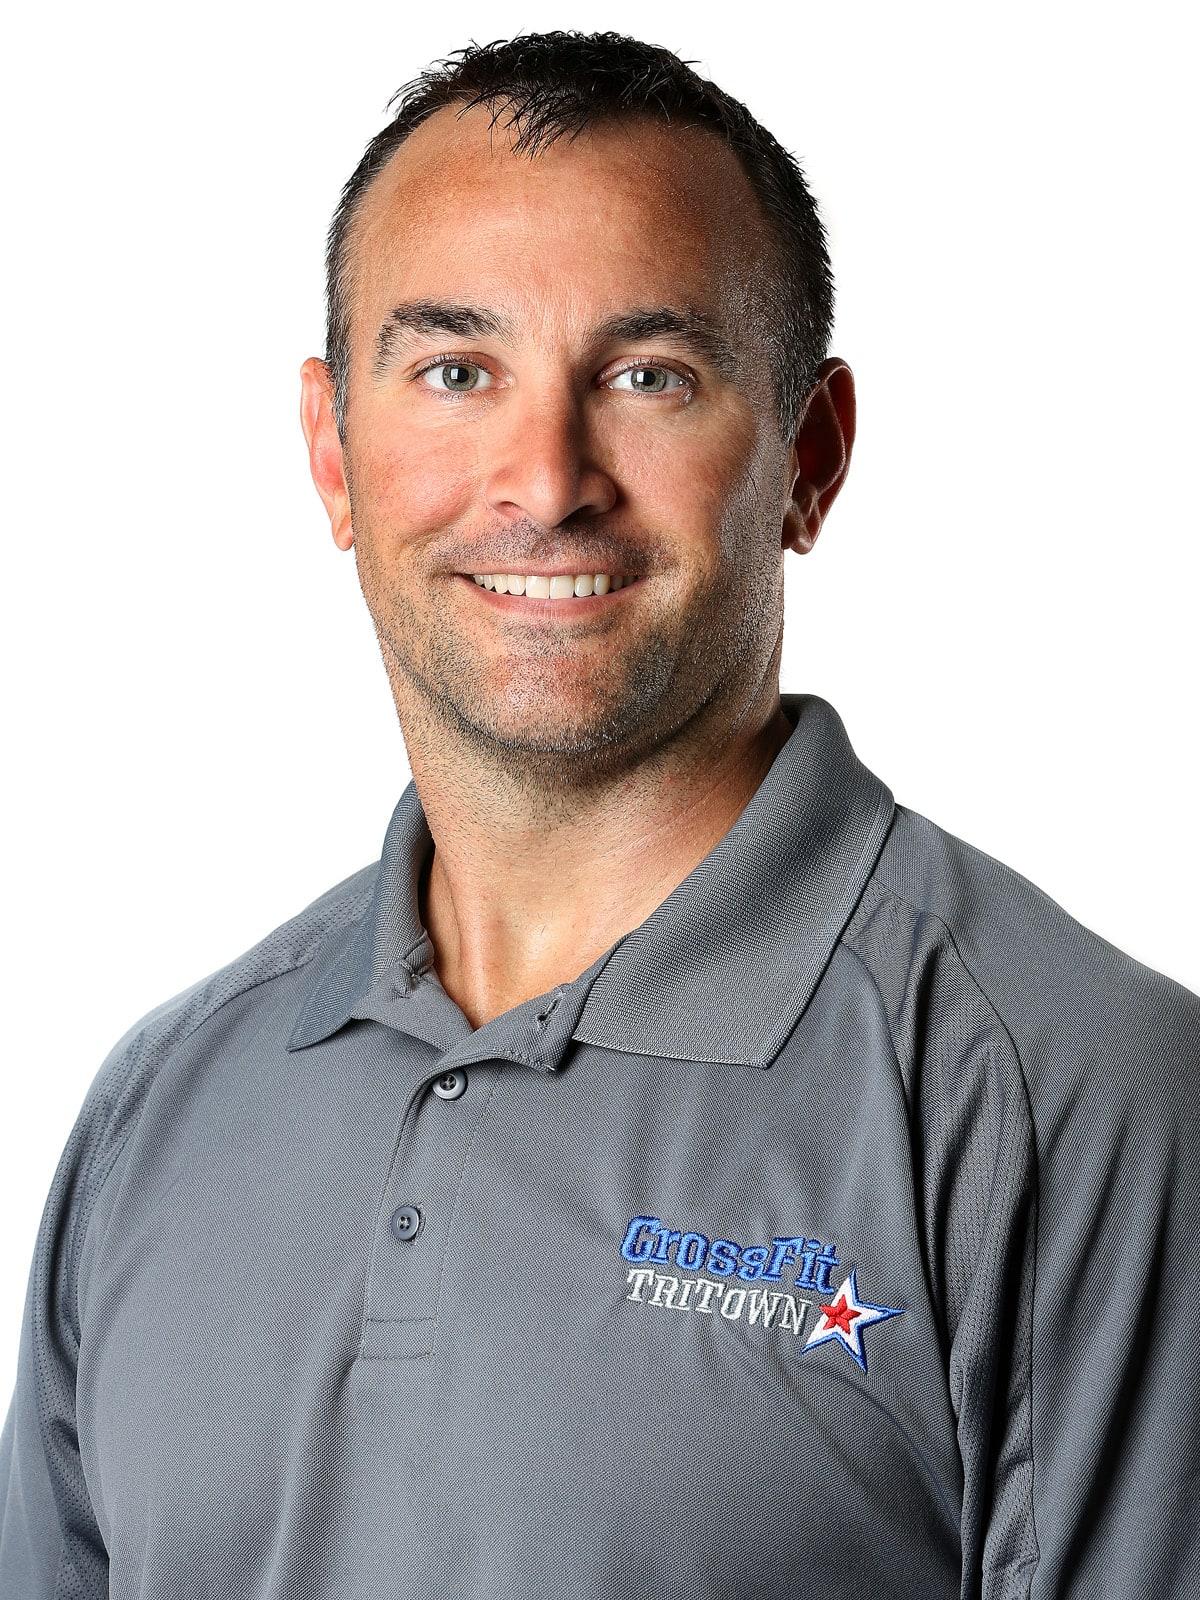 Michael Schultz in Monroe - CrossFit TriTown